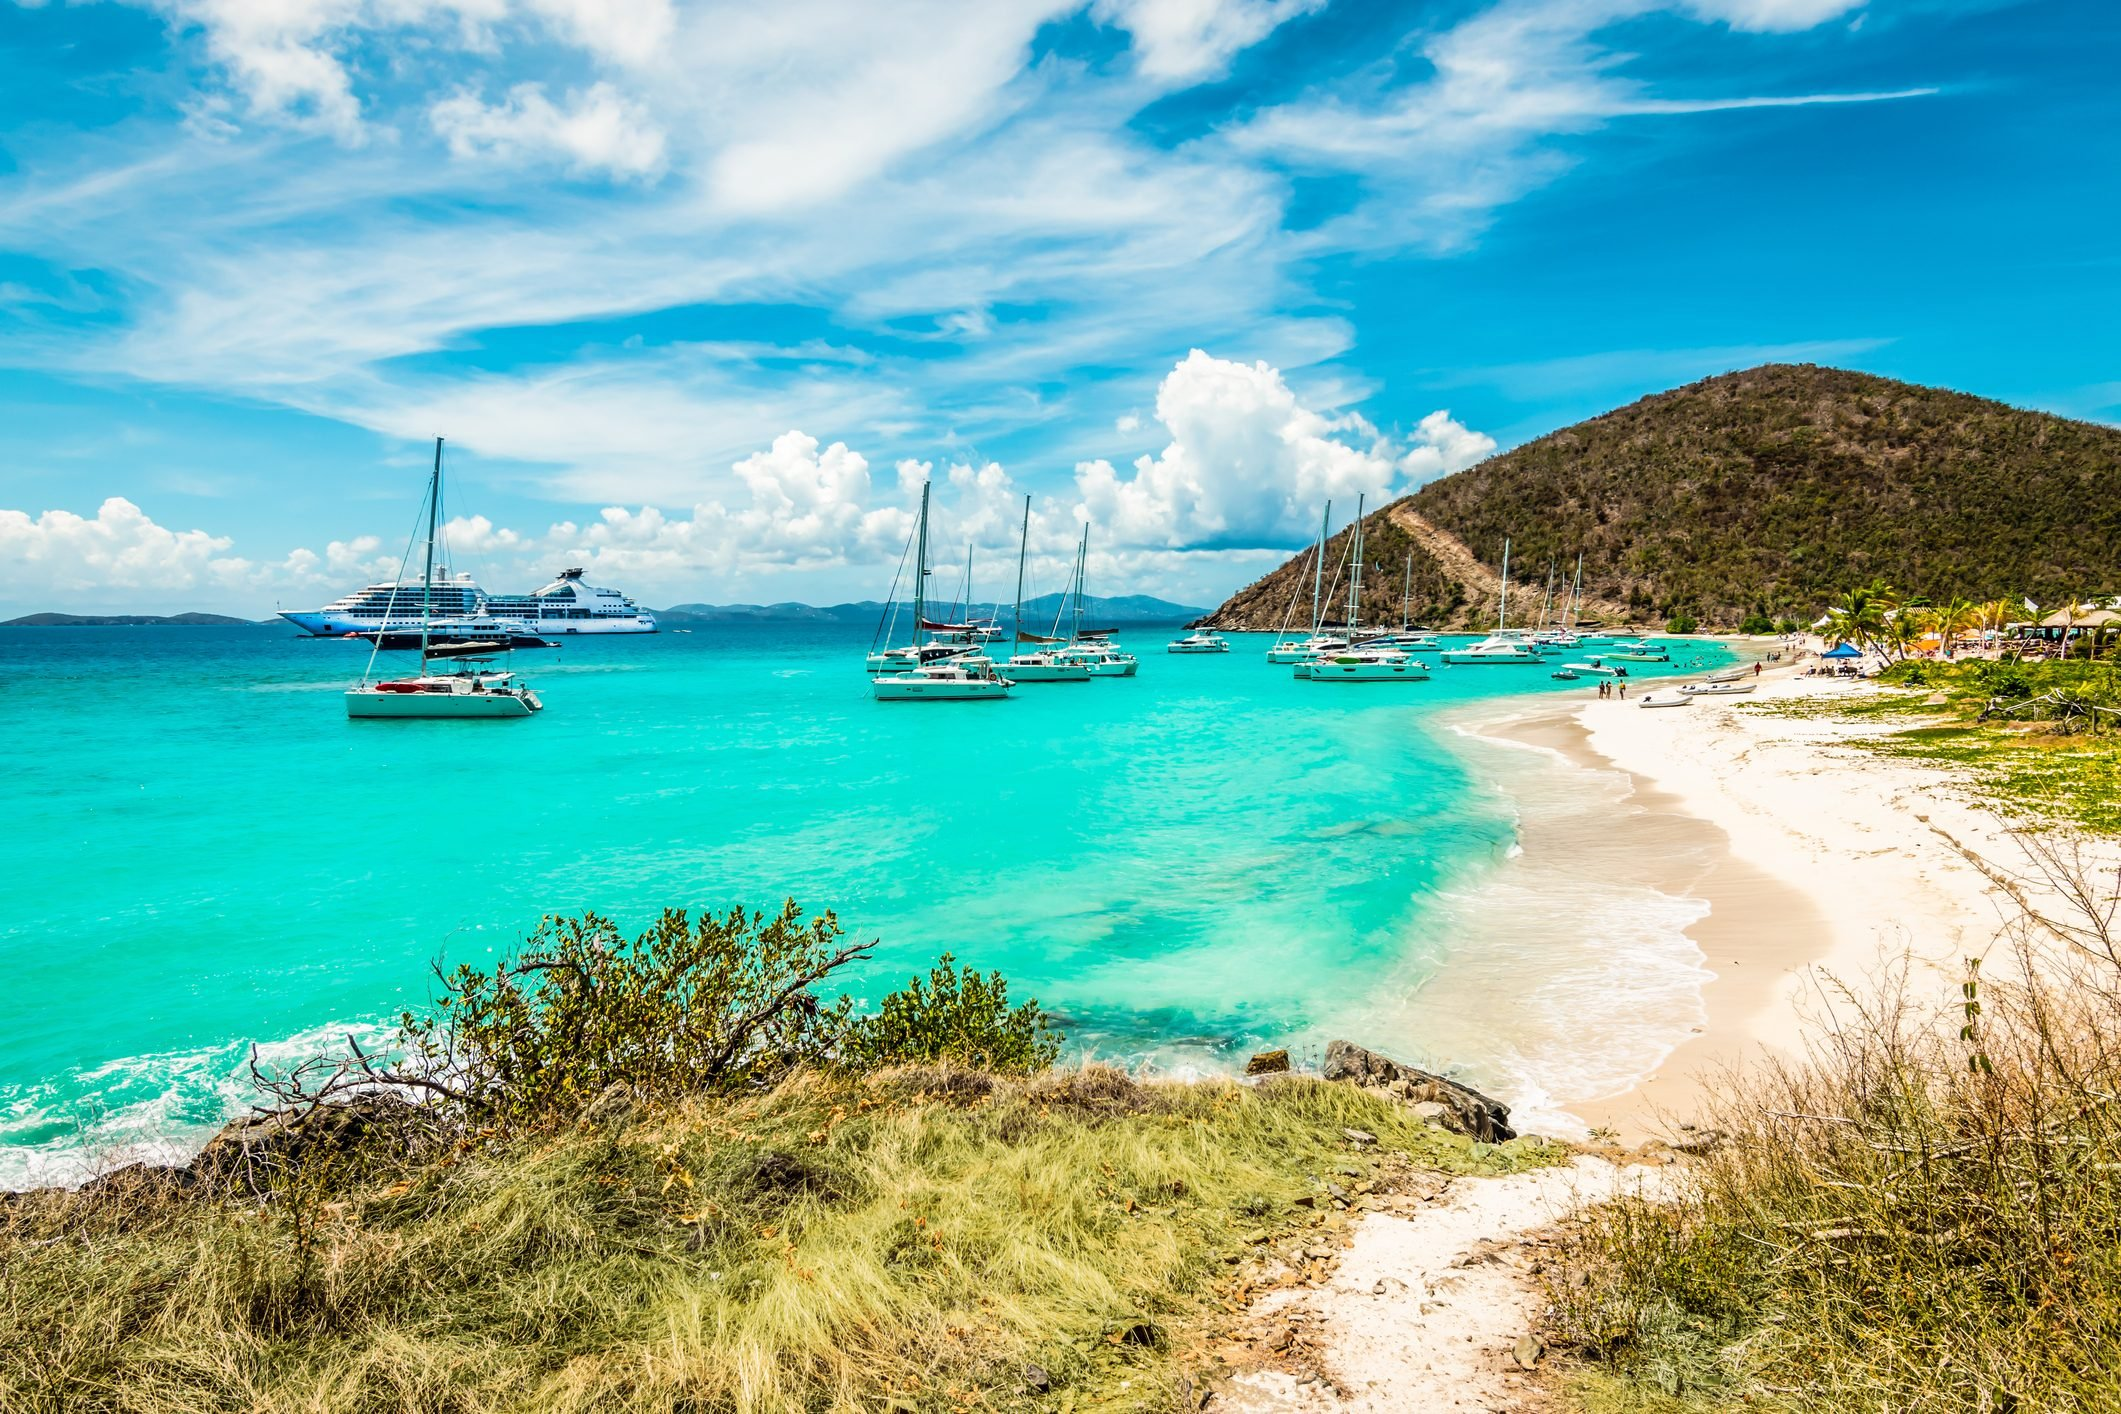 White Bay Beach, Jost Van Dyke, British Virgin Islands.